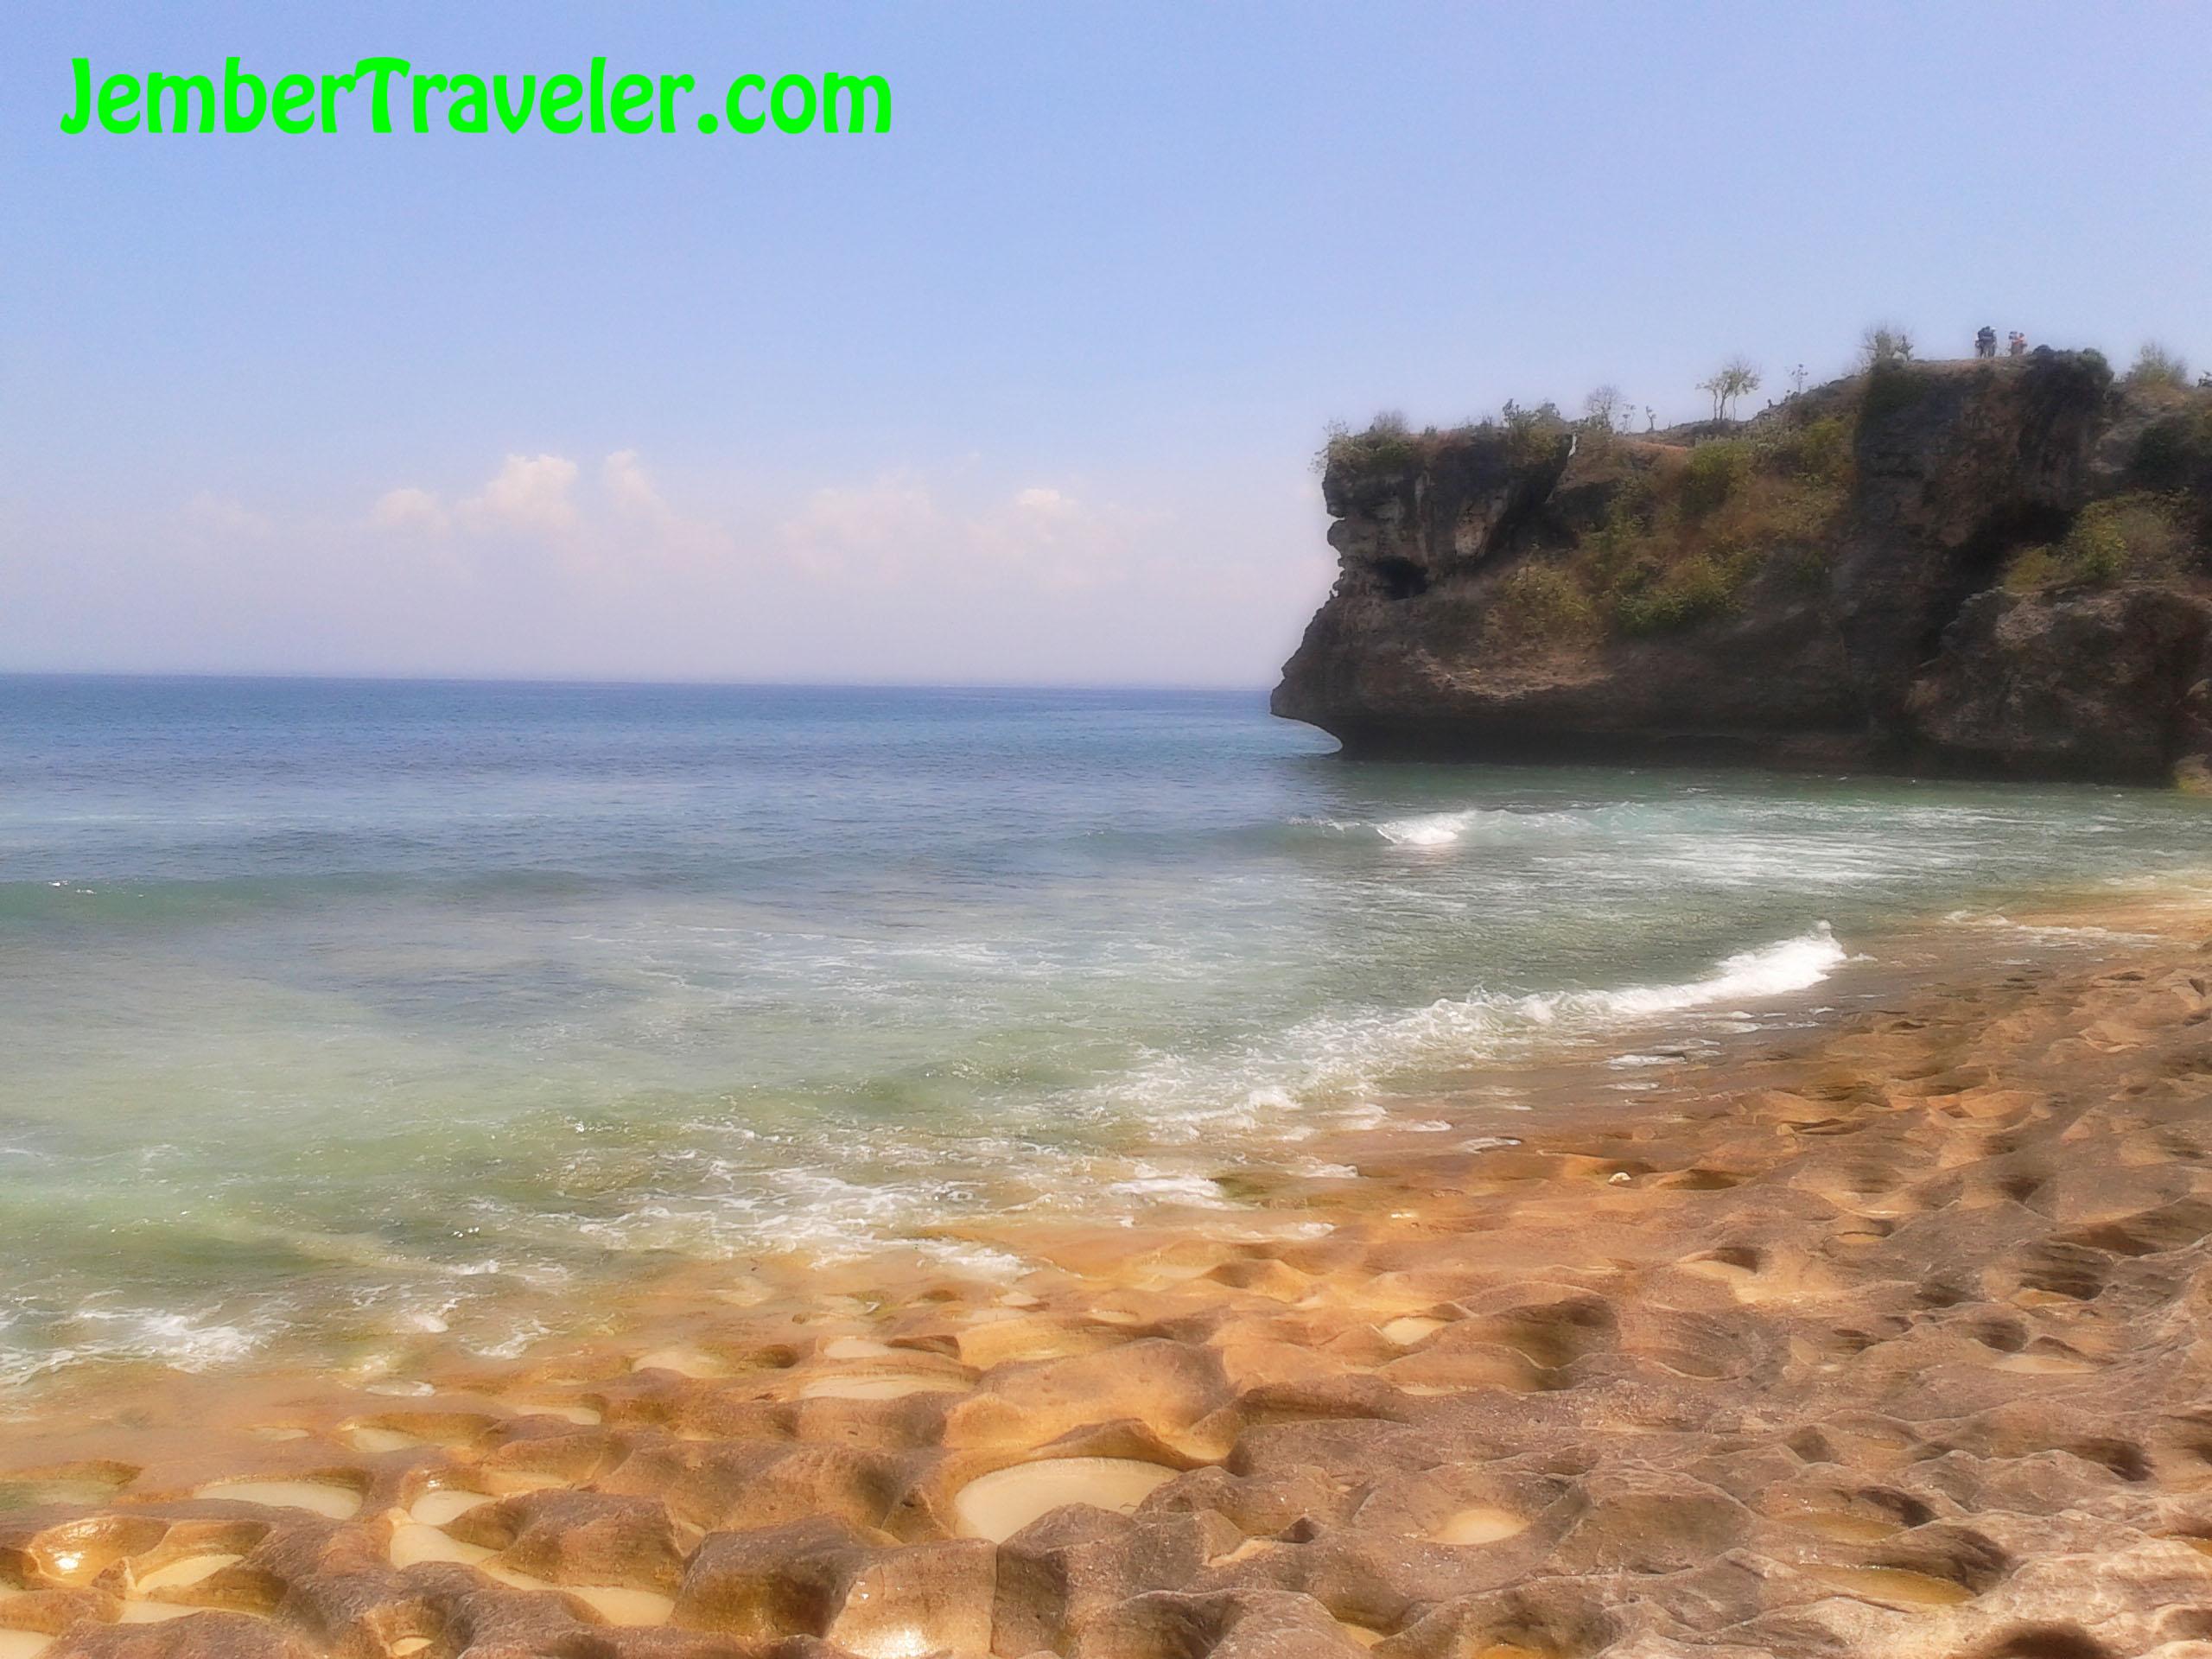 Pantai Balangan Pantai Tersembunyi Di Bali Jember Traveler